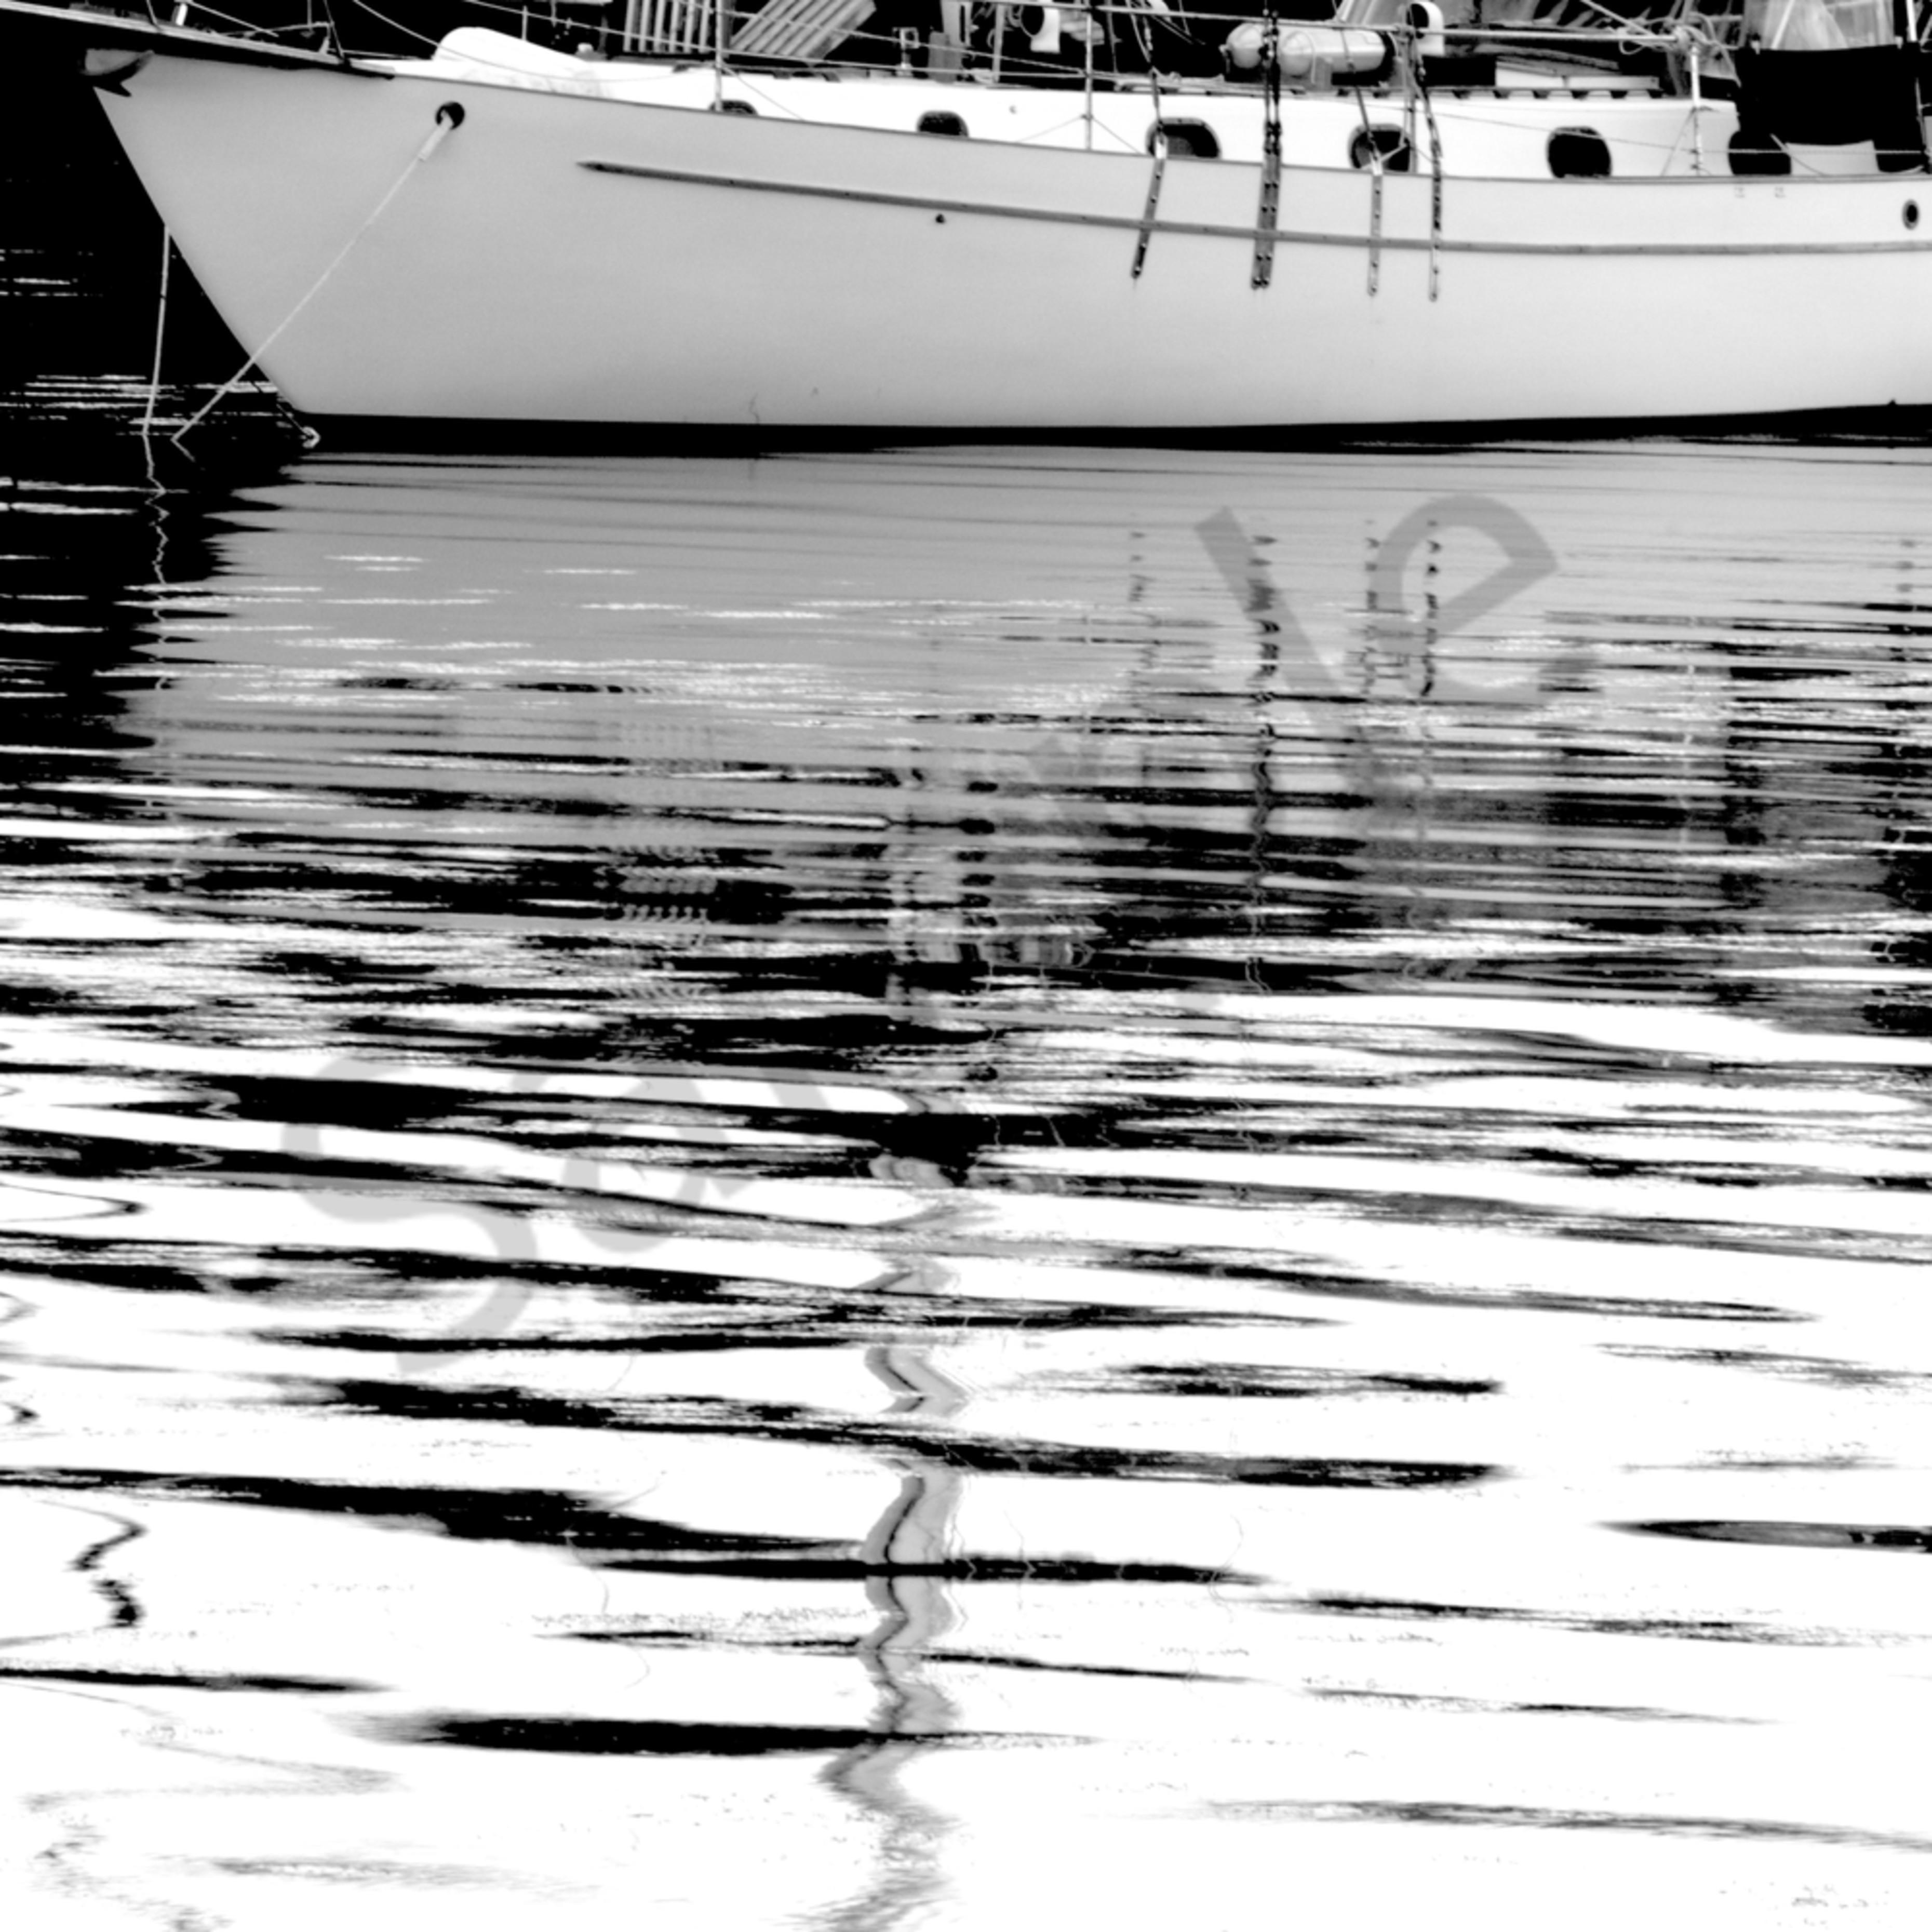 Bw boat c9cfcw